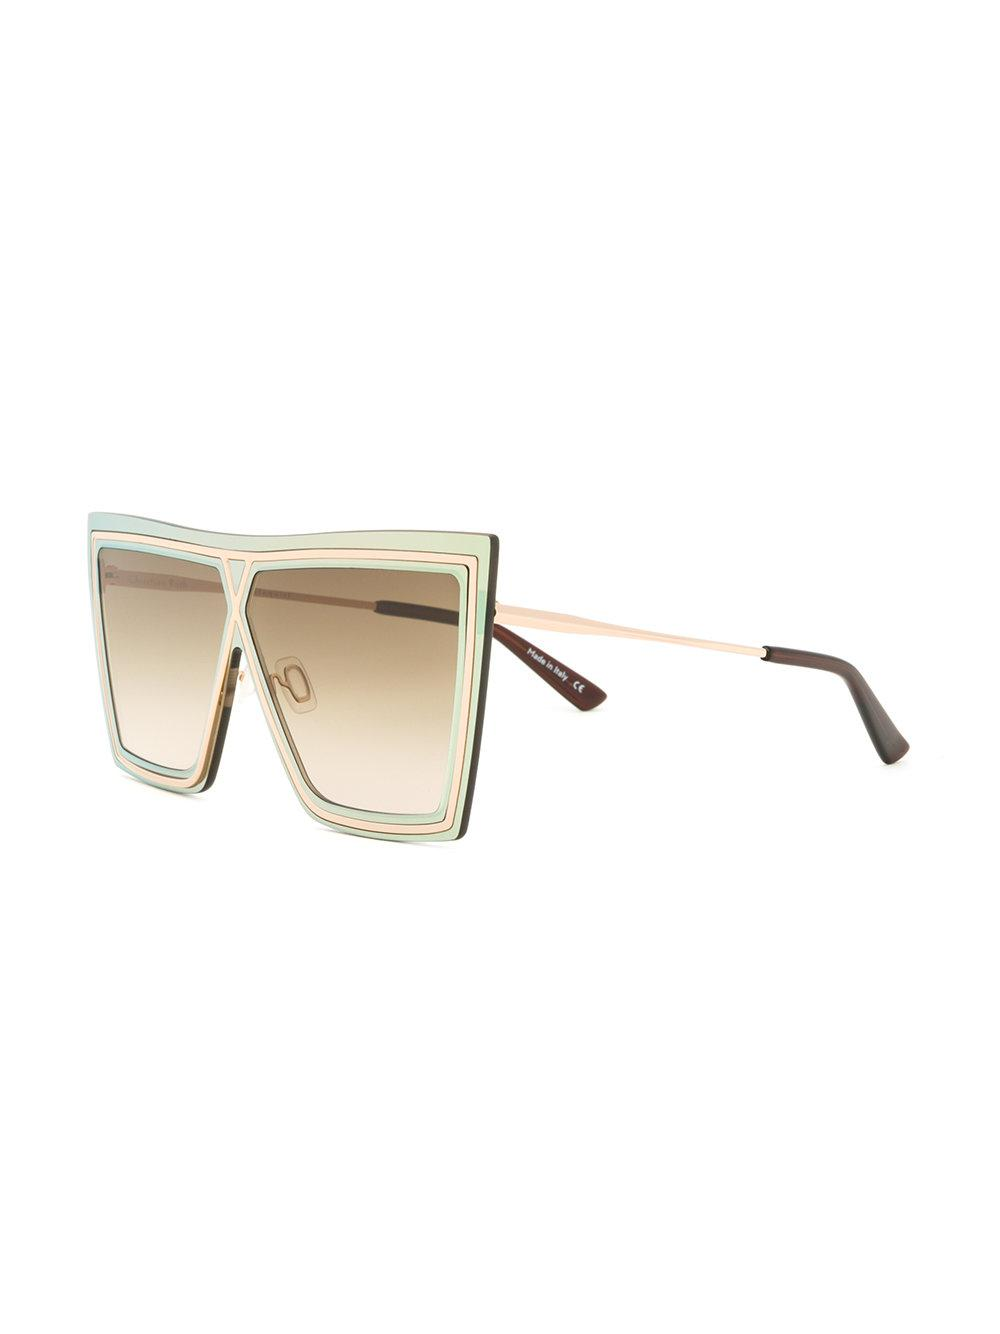 Christian Roth Ventriloquist Sunglasses in Metallic